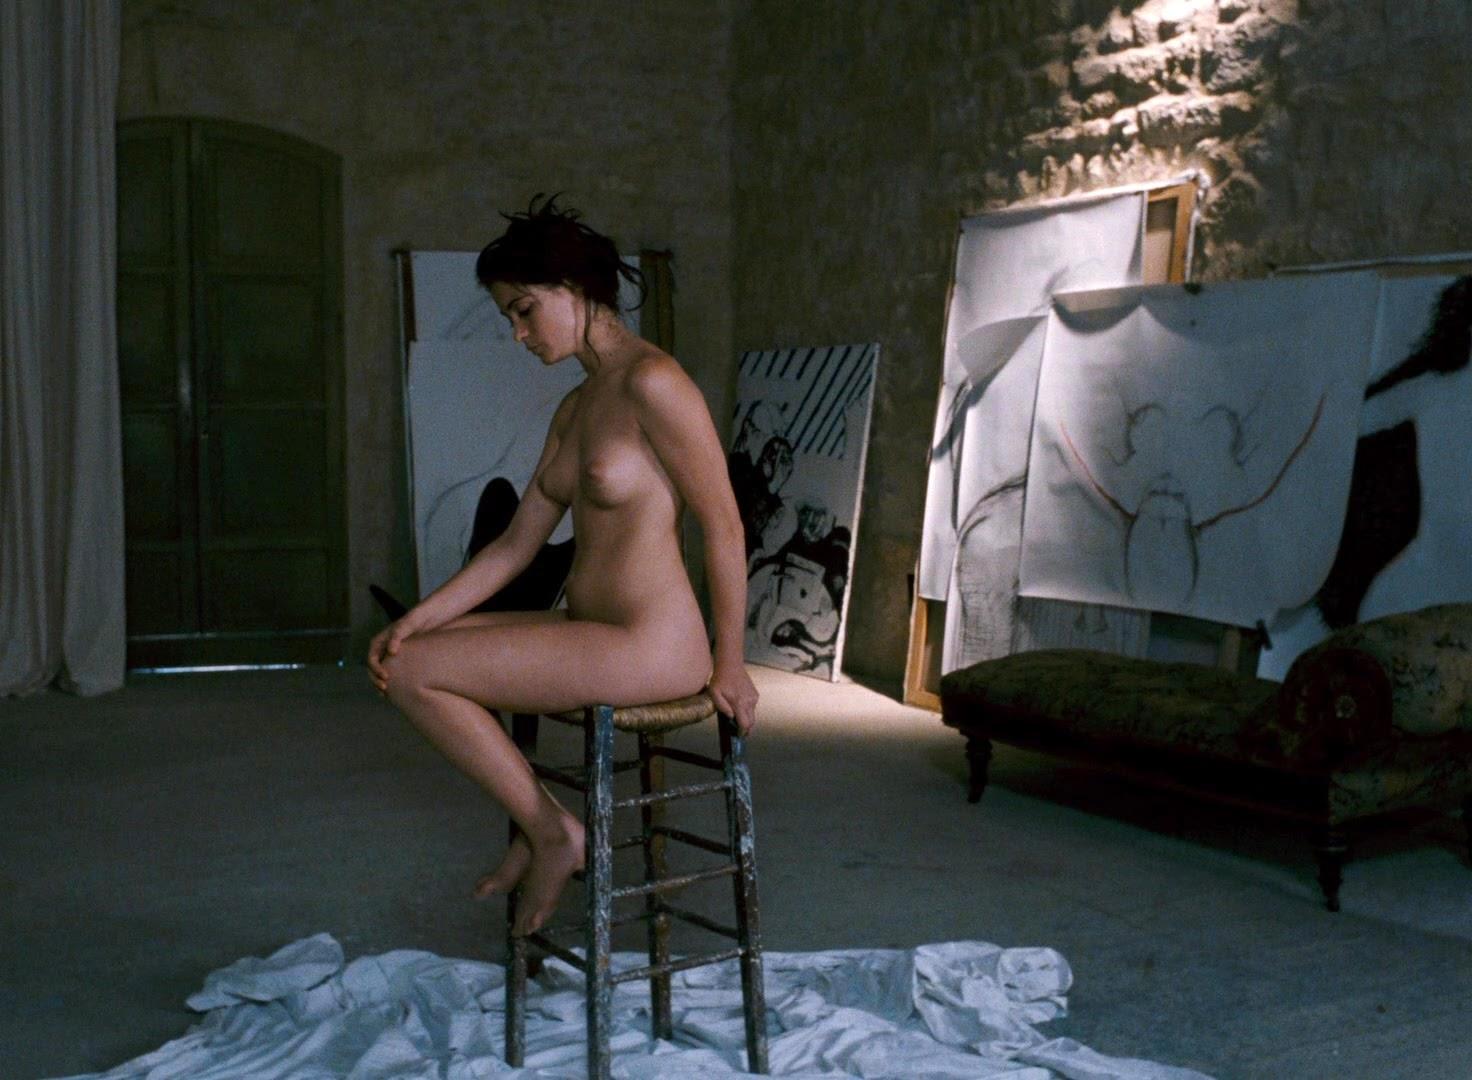 Emmanuelle beart nude in the beach, free ladyboy sex pics